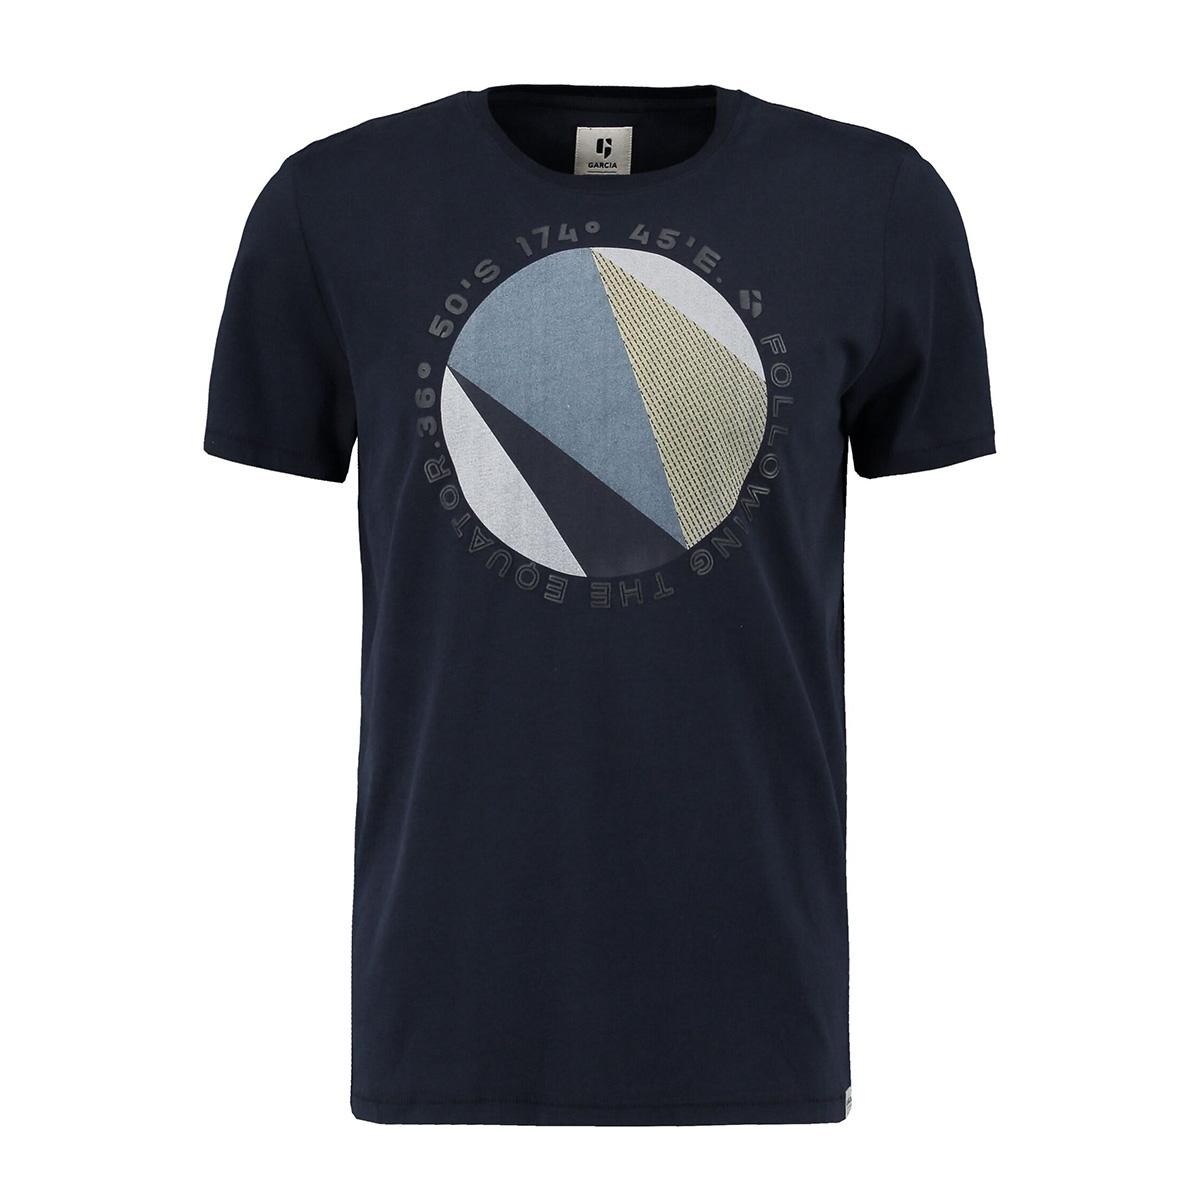 t shirt met print o01002 garcia t-shirt 292 dark moon